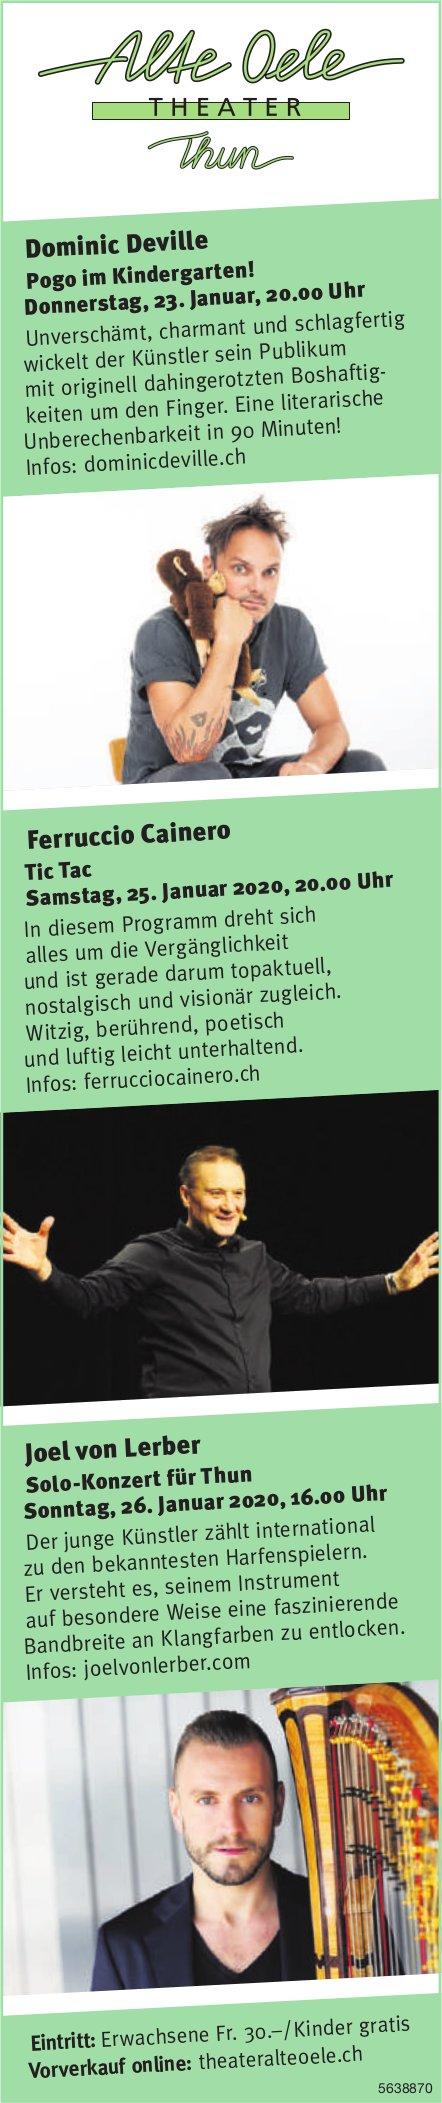 Alte Oele Theater - Programm